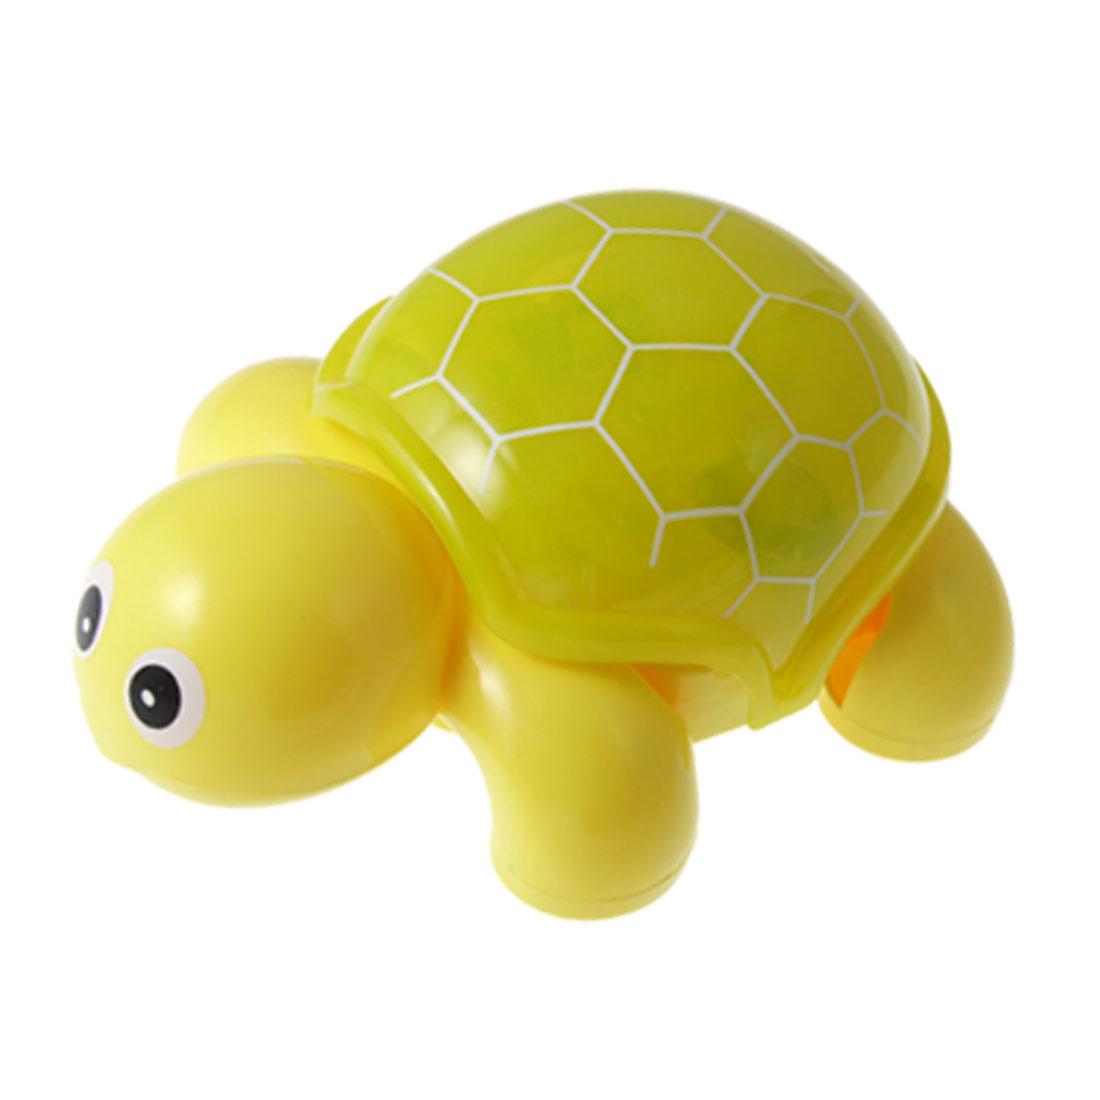 Kids Music Light Tortoise Plastic Animal Toy Gift Yellow